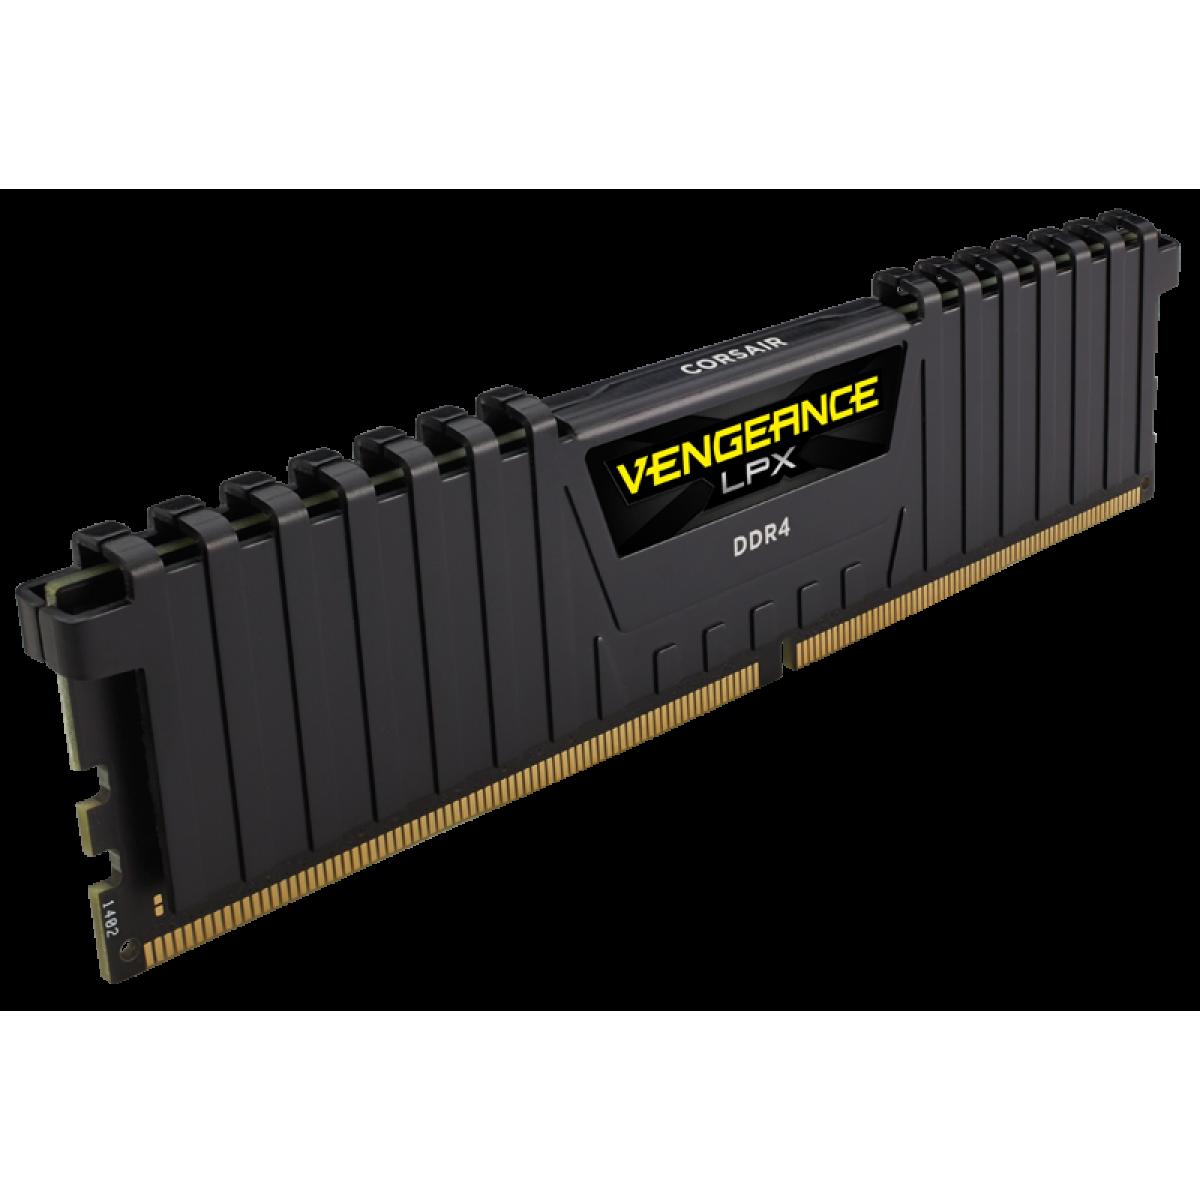 Memória DDR4 Corsair Vengeance LPX, 16GB (2X8GB) 2400MHz, CMK16GX4M2A2400C16